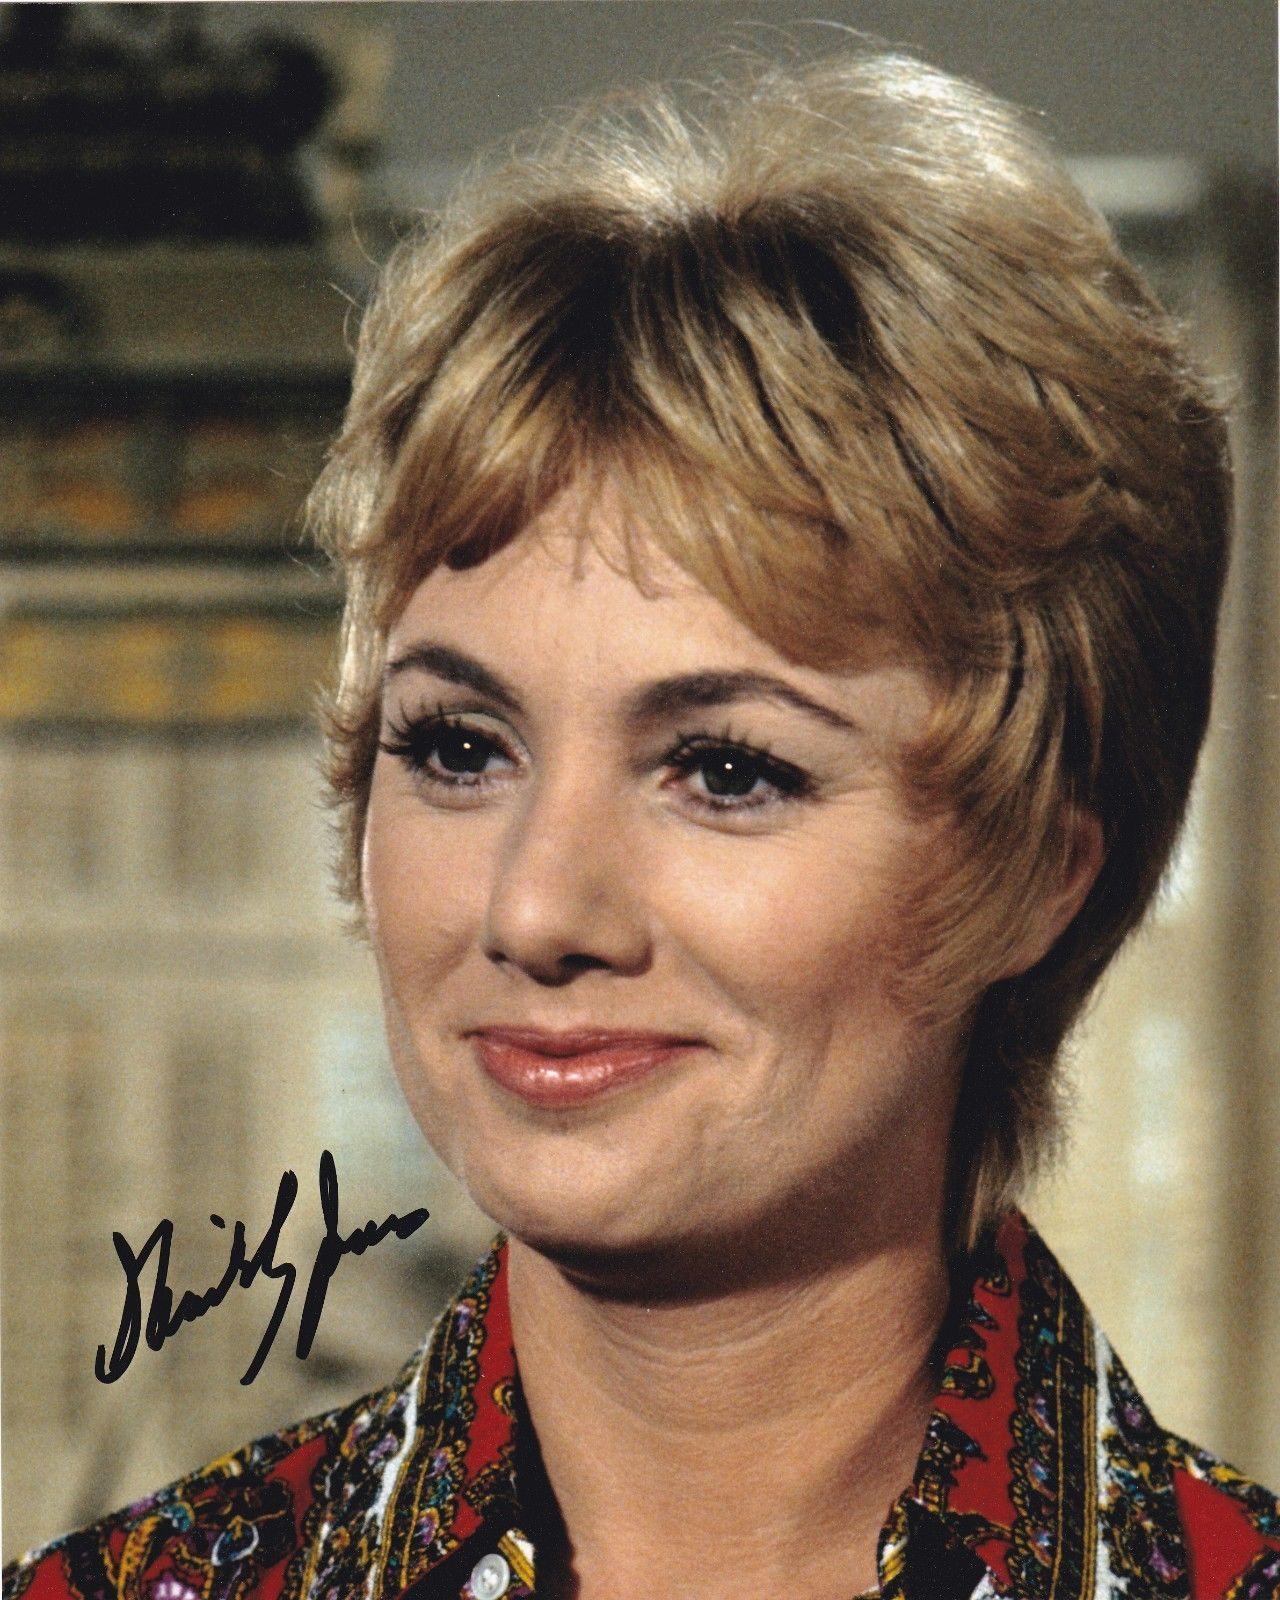 Shirley Jones | Shirley jones, Partridge family cast, Partridge family